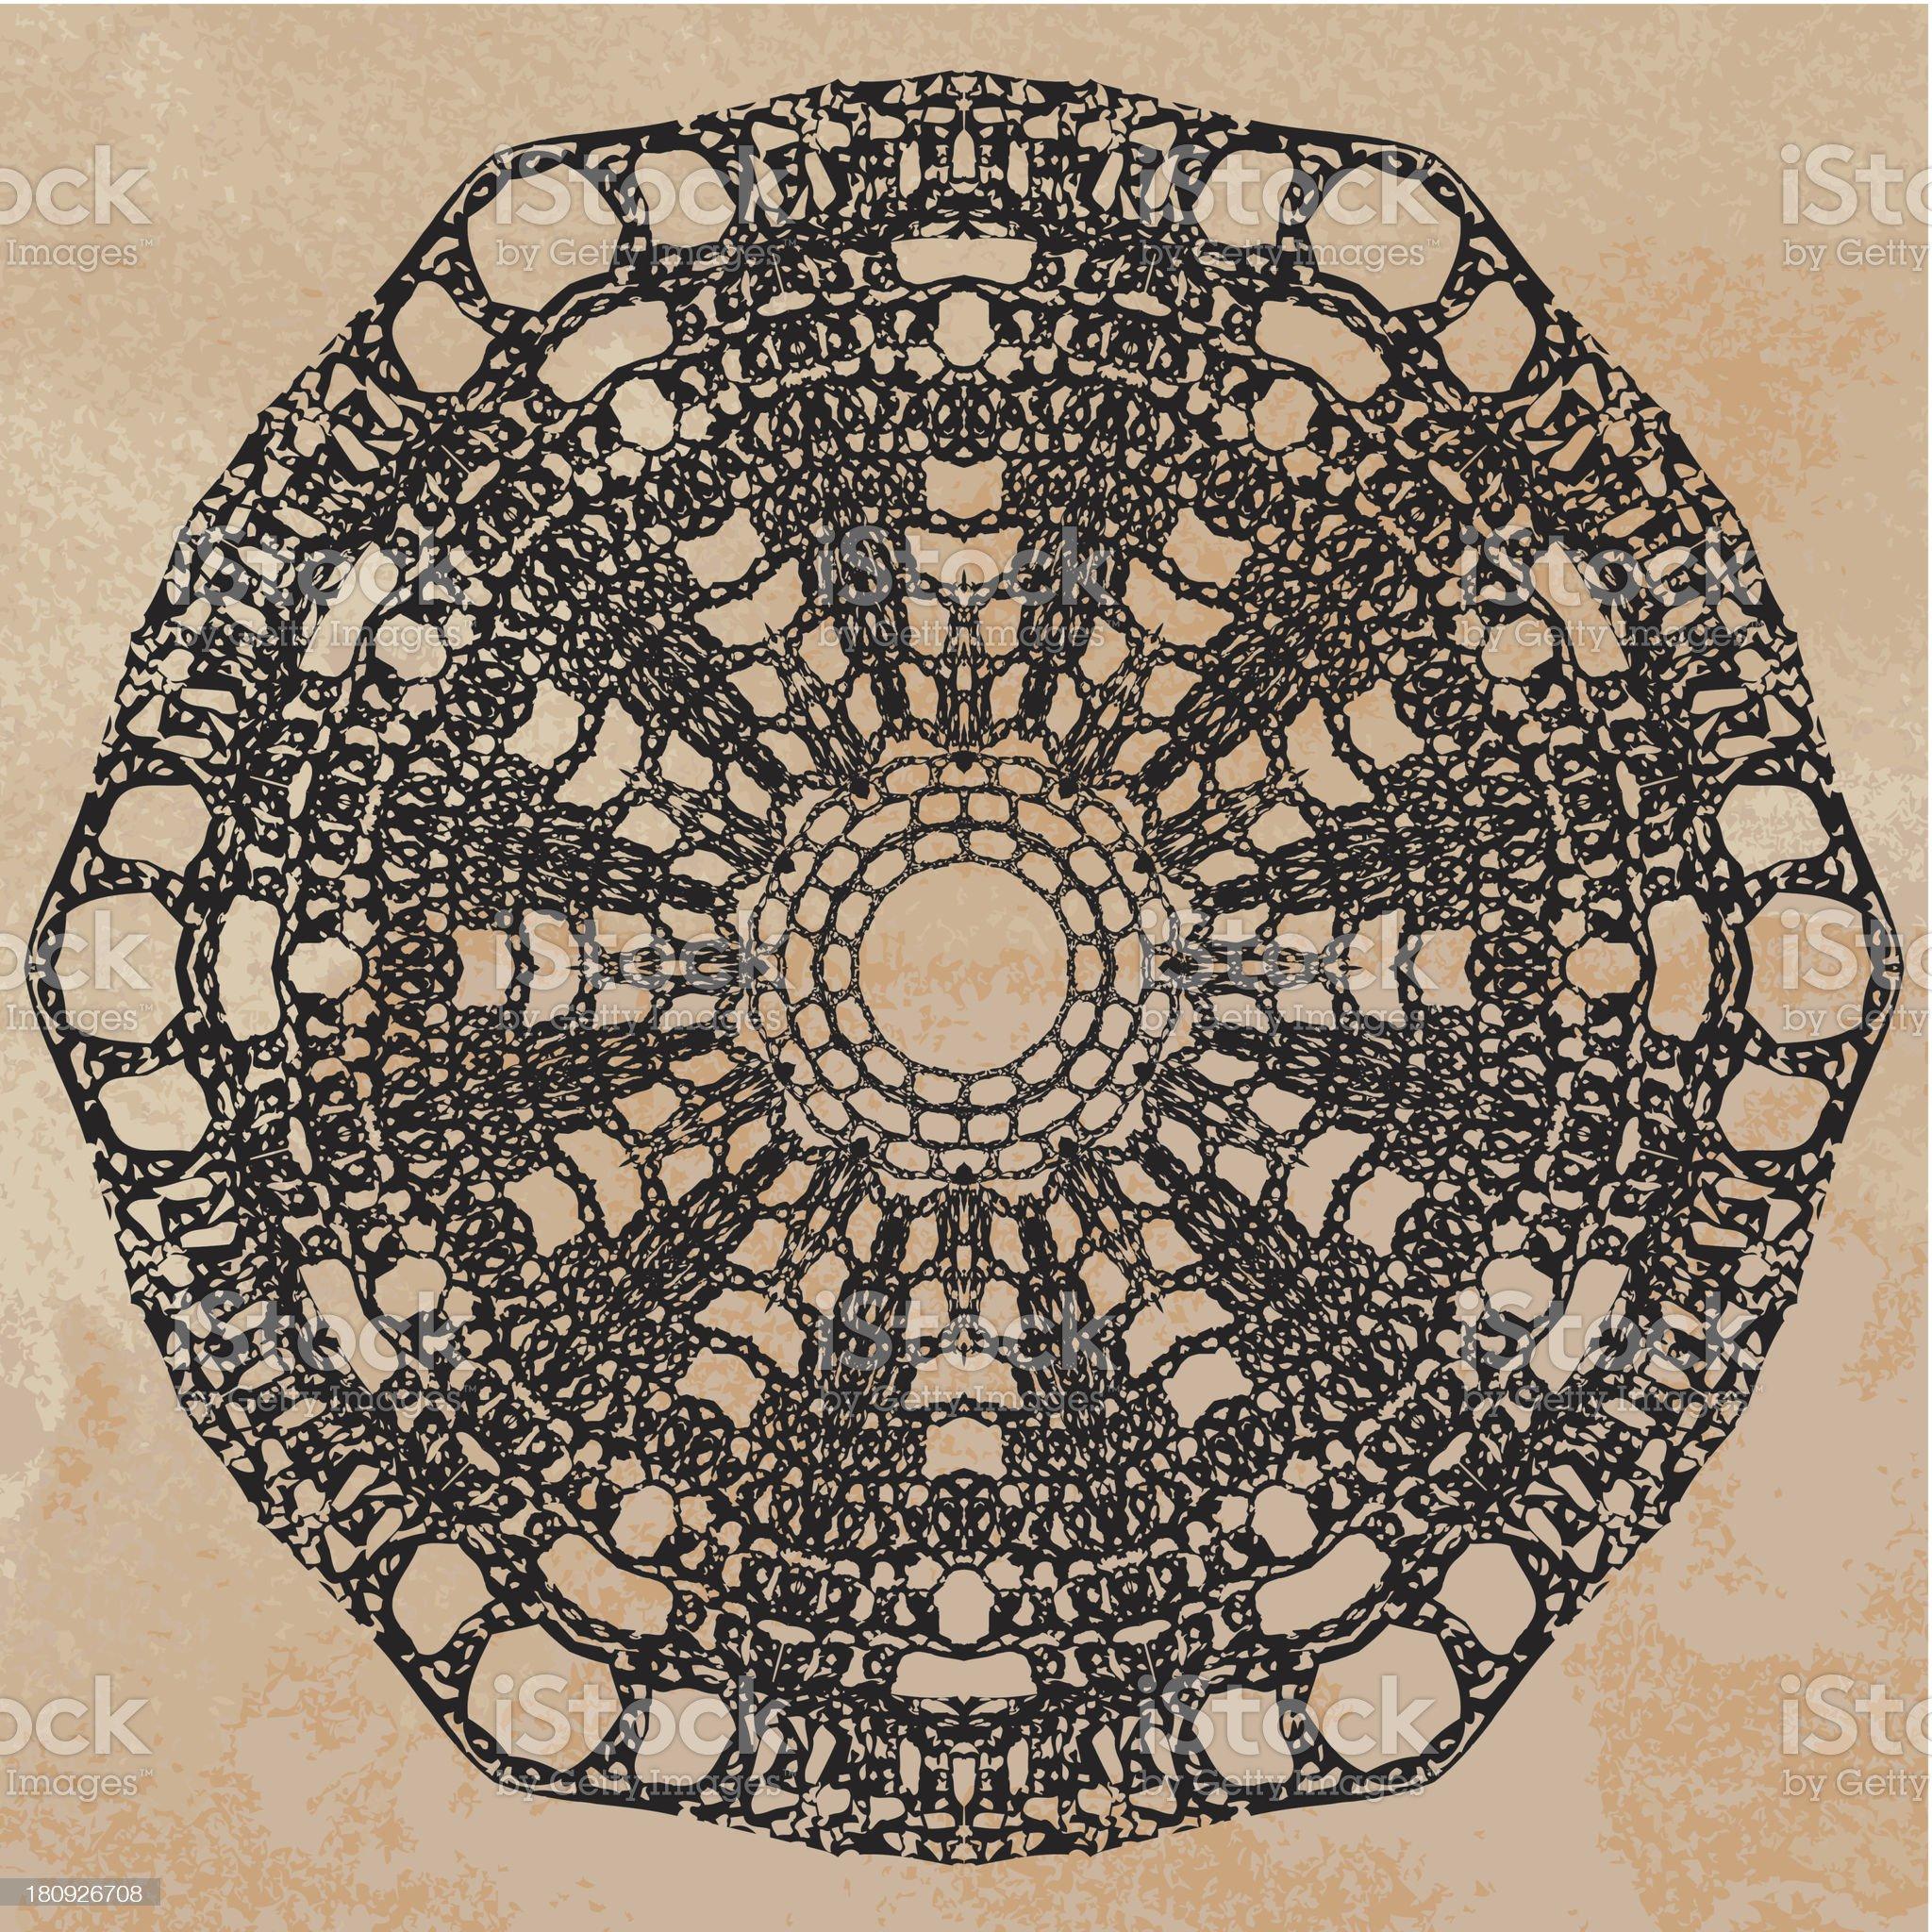 Elegant lacy doily royalty-free stock vector art